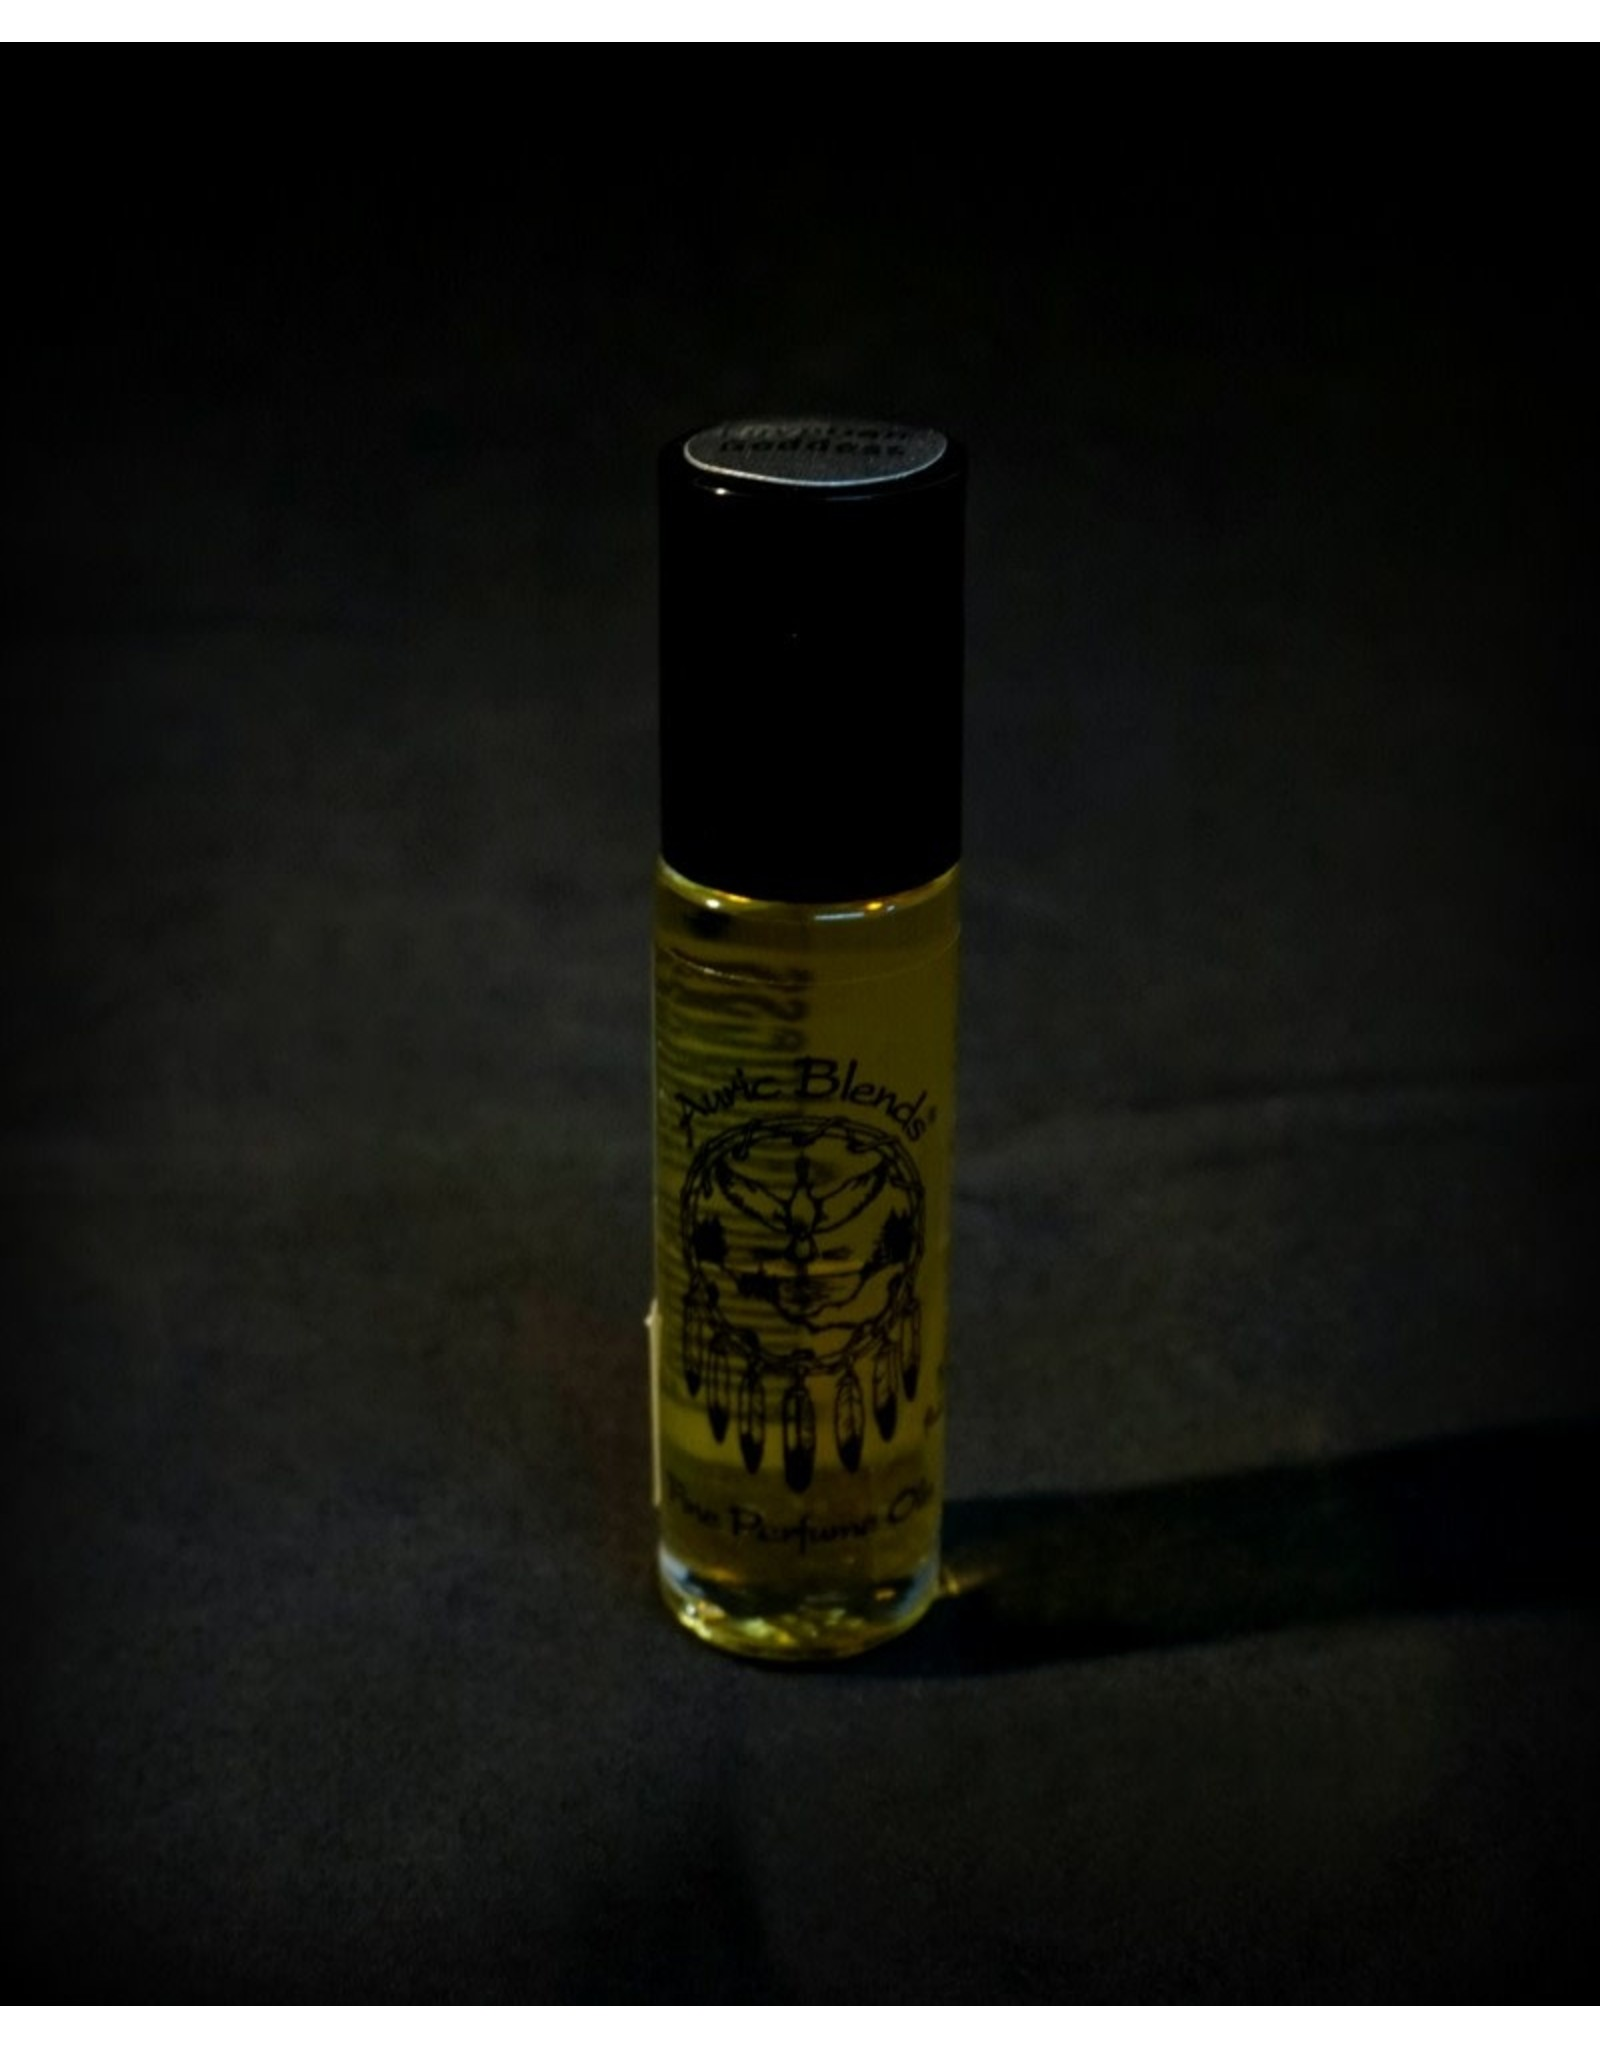 Auric Blends Auric Blends Roll On Perfume Oil - Egyptian Goddess